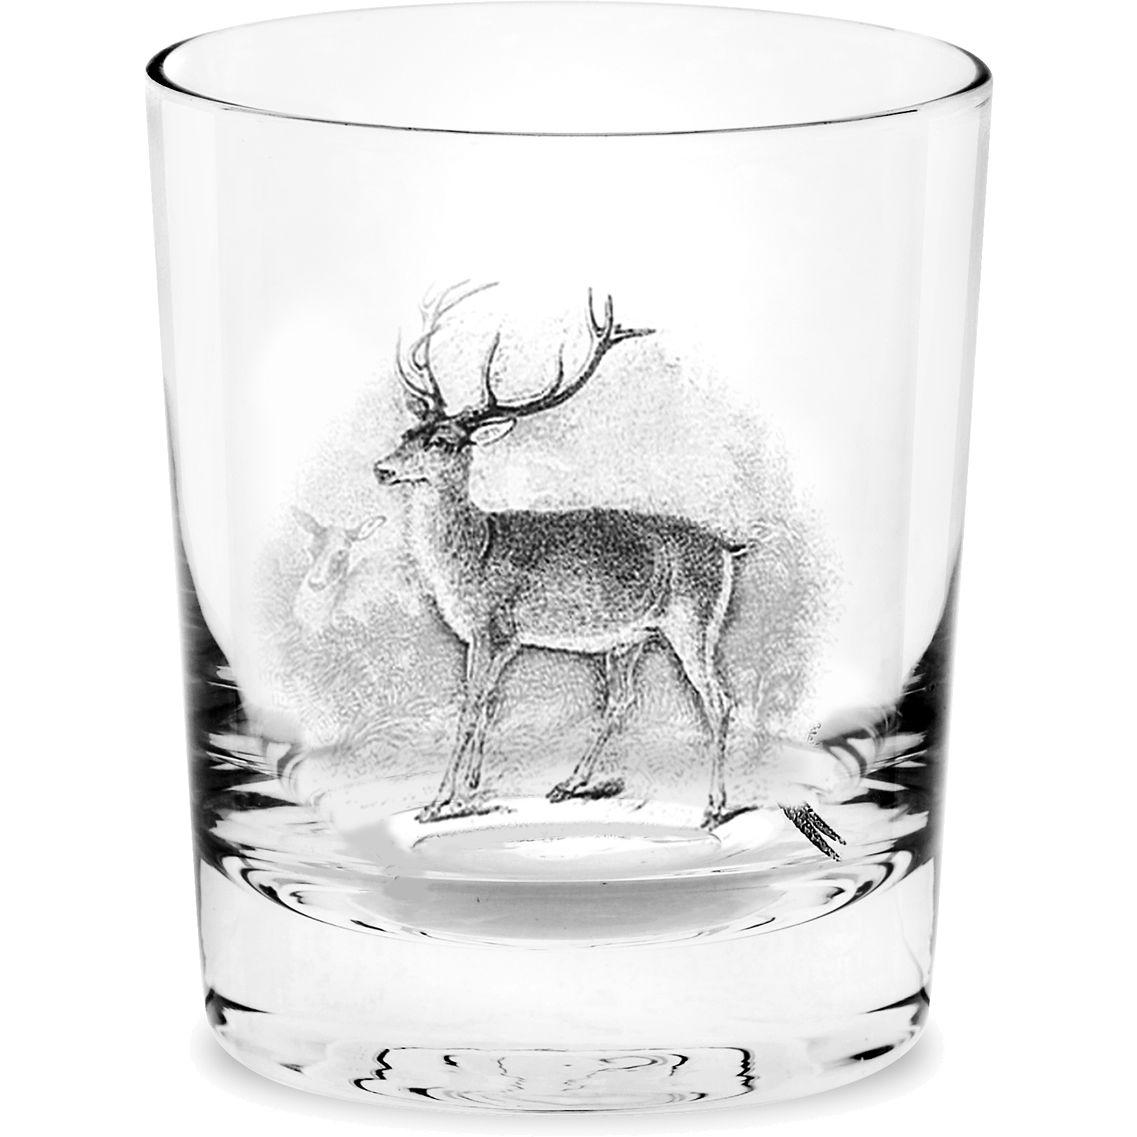 Spode Glen Lodge Whiskey Glass Set Of 4 Stag Louis Potts